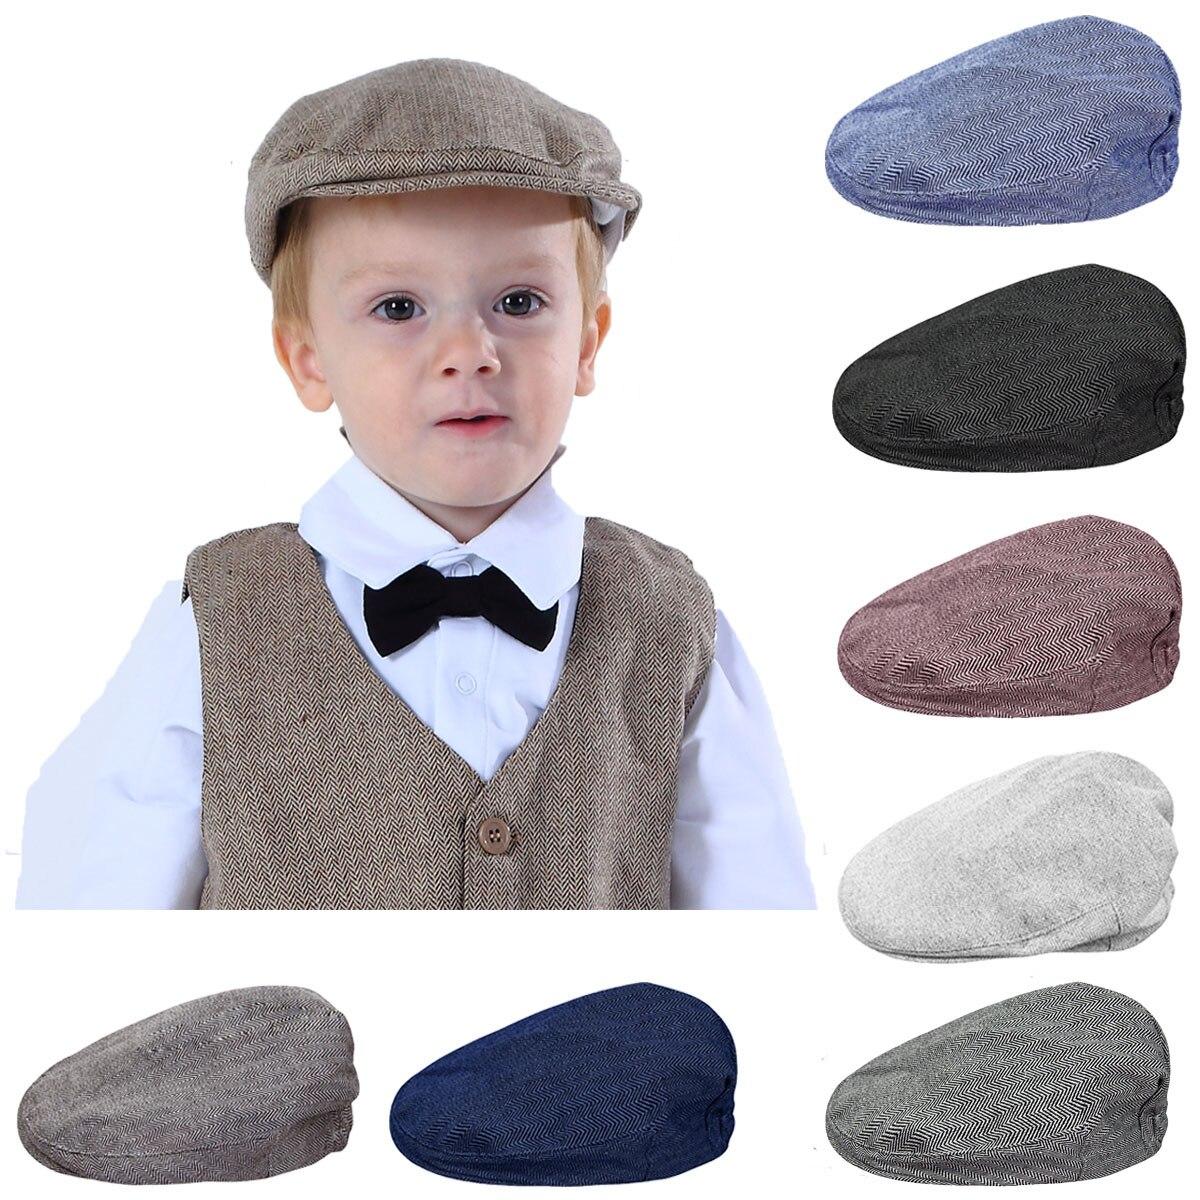 Retro Baby Kids Child Beret Cap Winter Boy/&Girl Infant Toddler Peaked Flat Hat